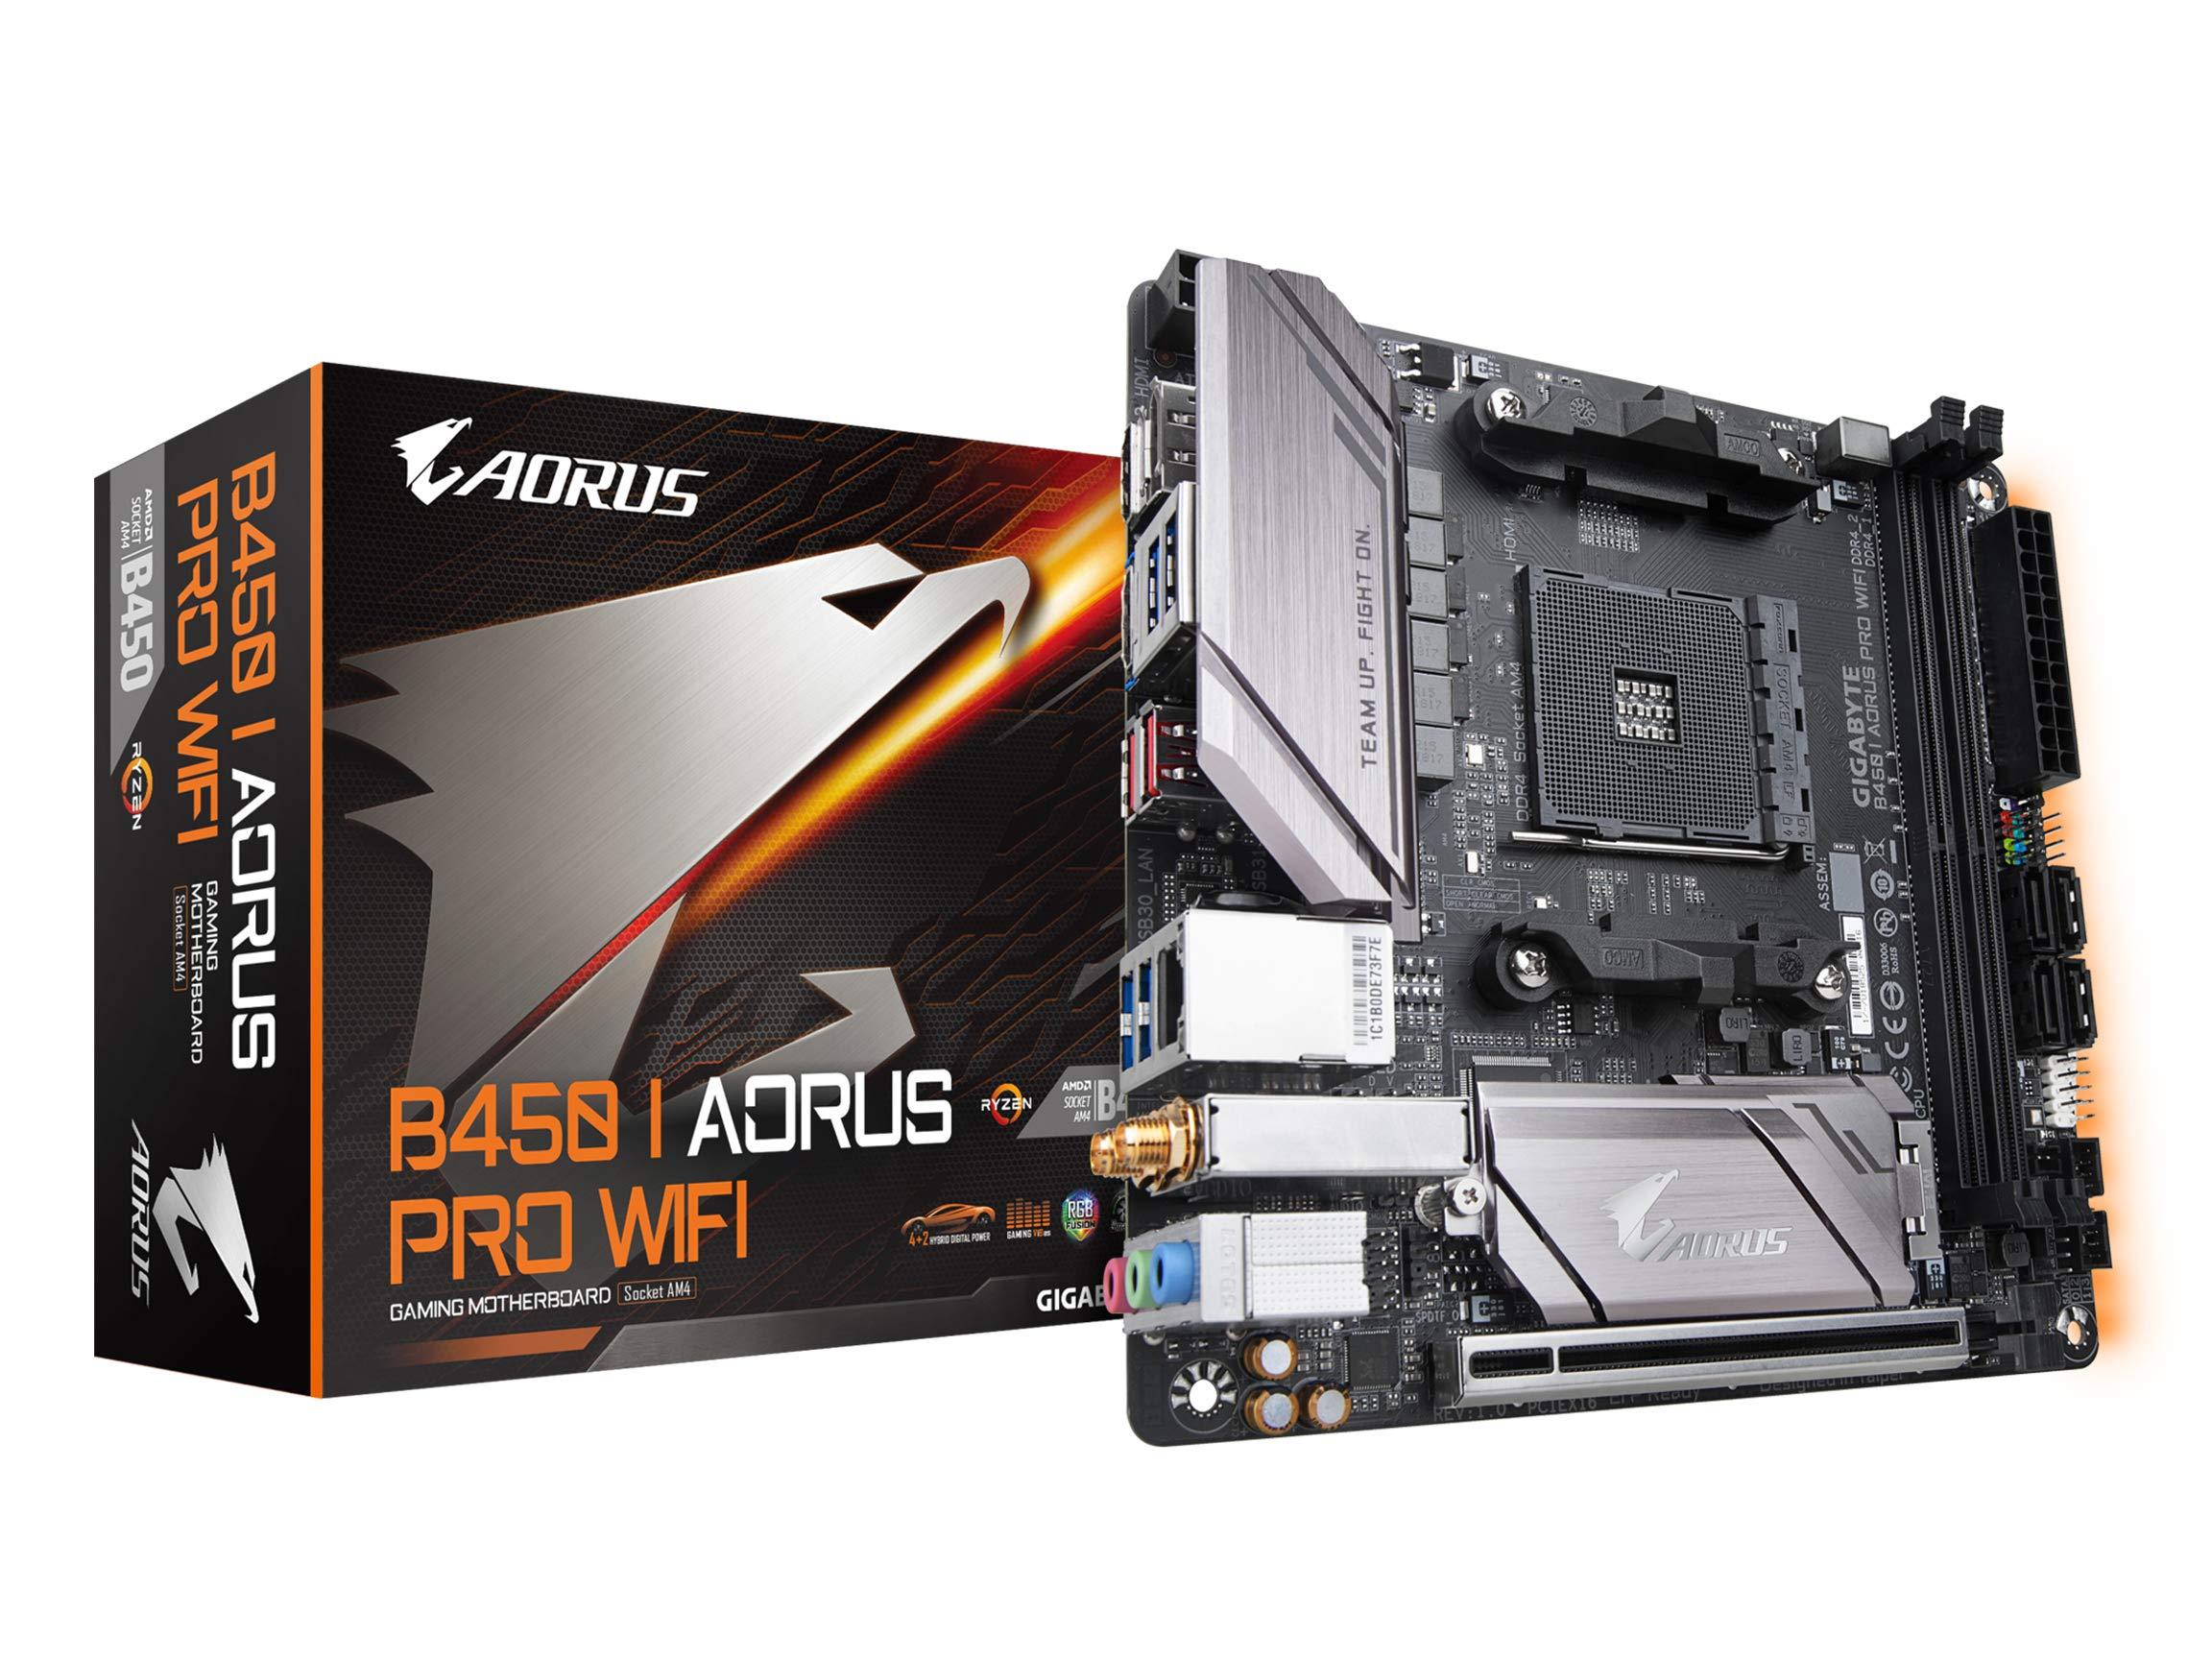 GIGABYTE B450 I AORUS PRO WiFi (AMD Ryzen AM4/M.2 Thermal Guard with Onboard WiFi/HDMI/DP/USB 3.1 Gen 2/Mini ITX/Motherboard) by Gigabyte